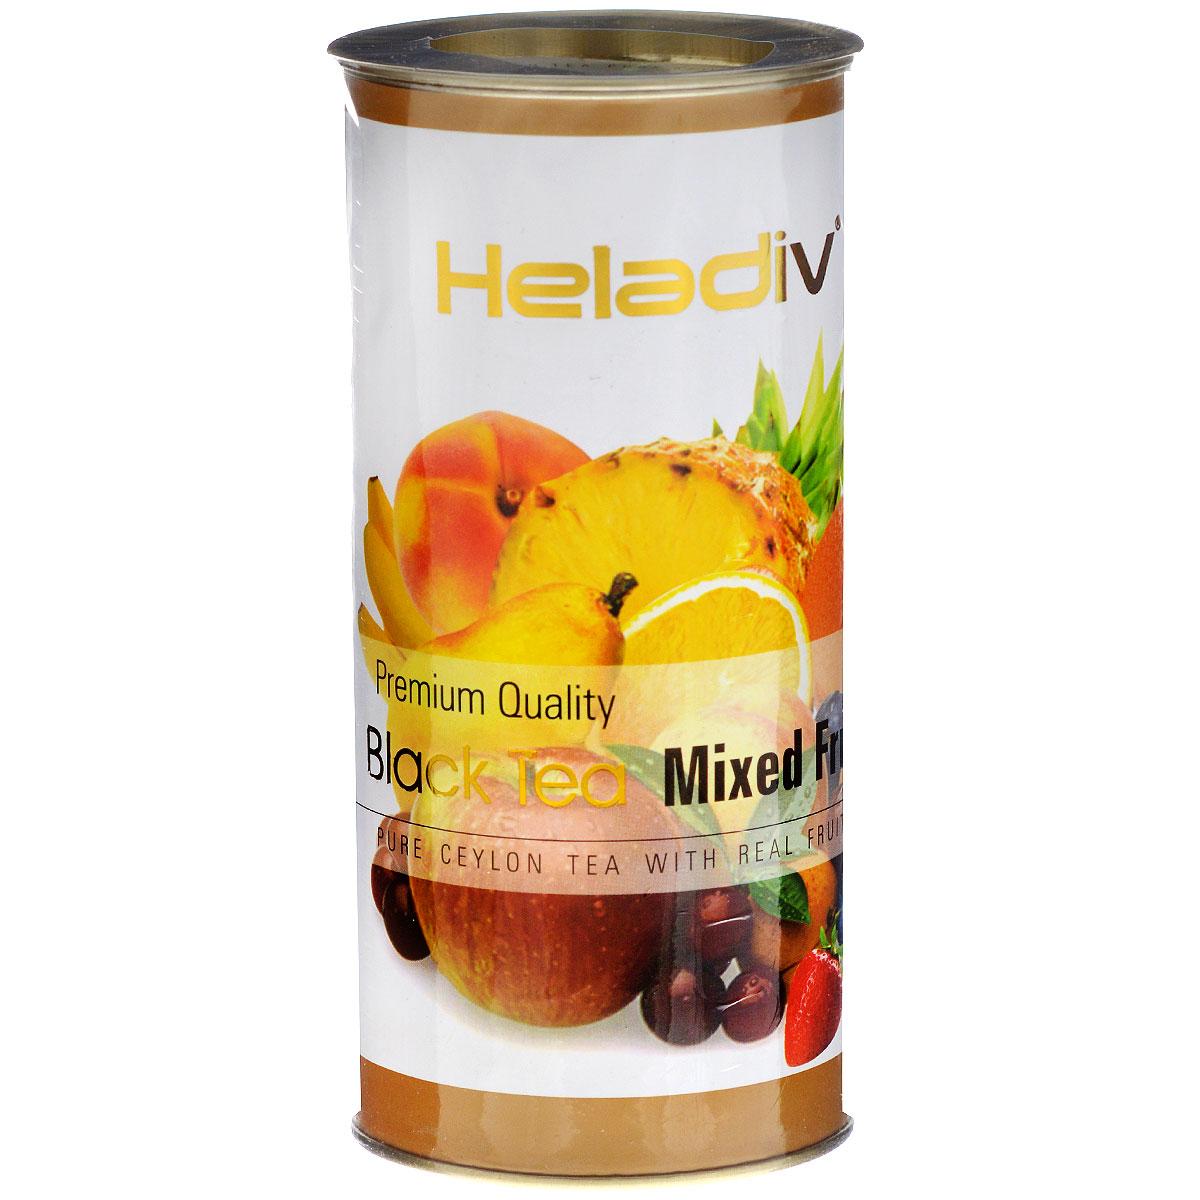 Heladiv Mixed Fruit черный фруктовый чай, 100 г heladiv opa